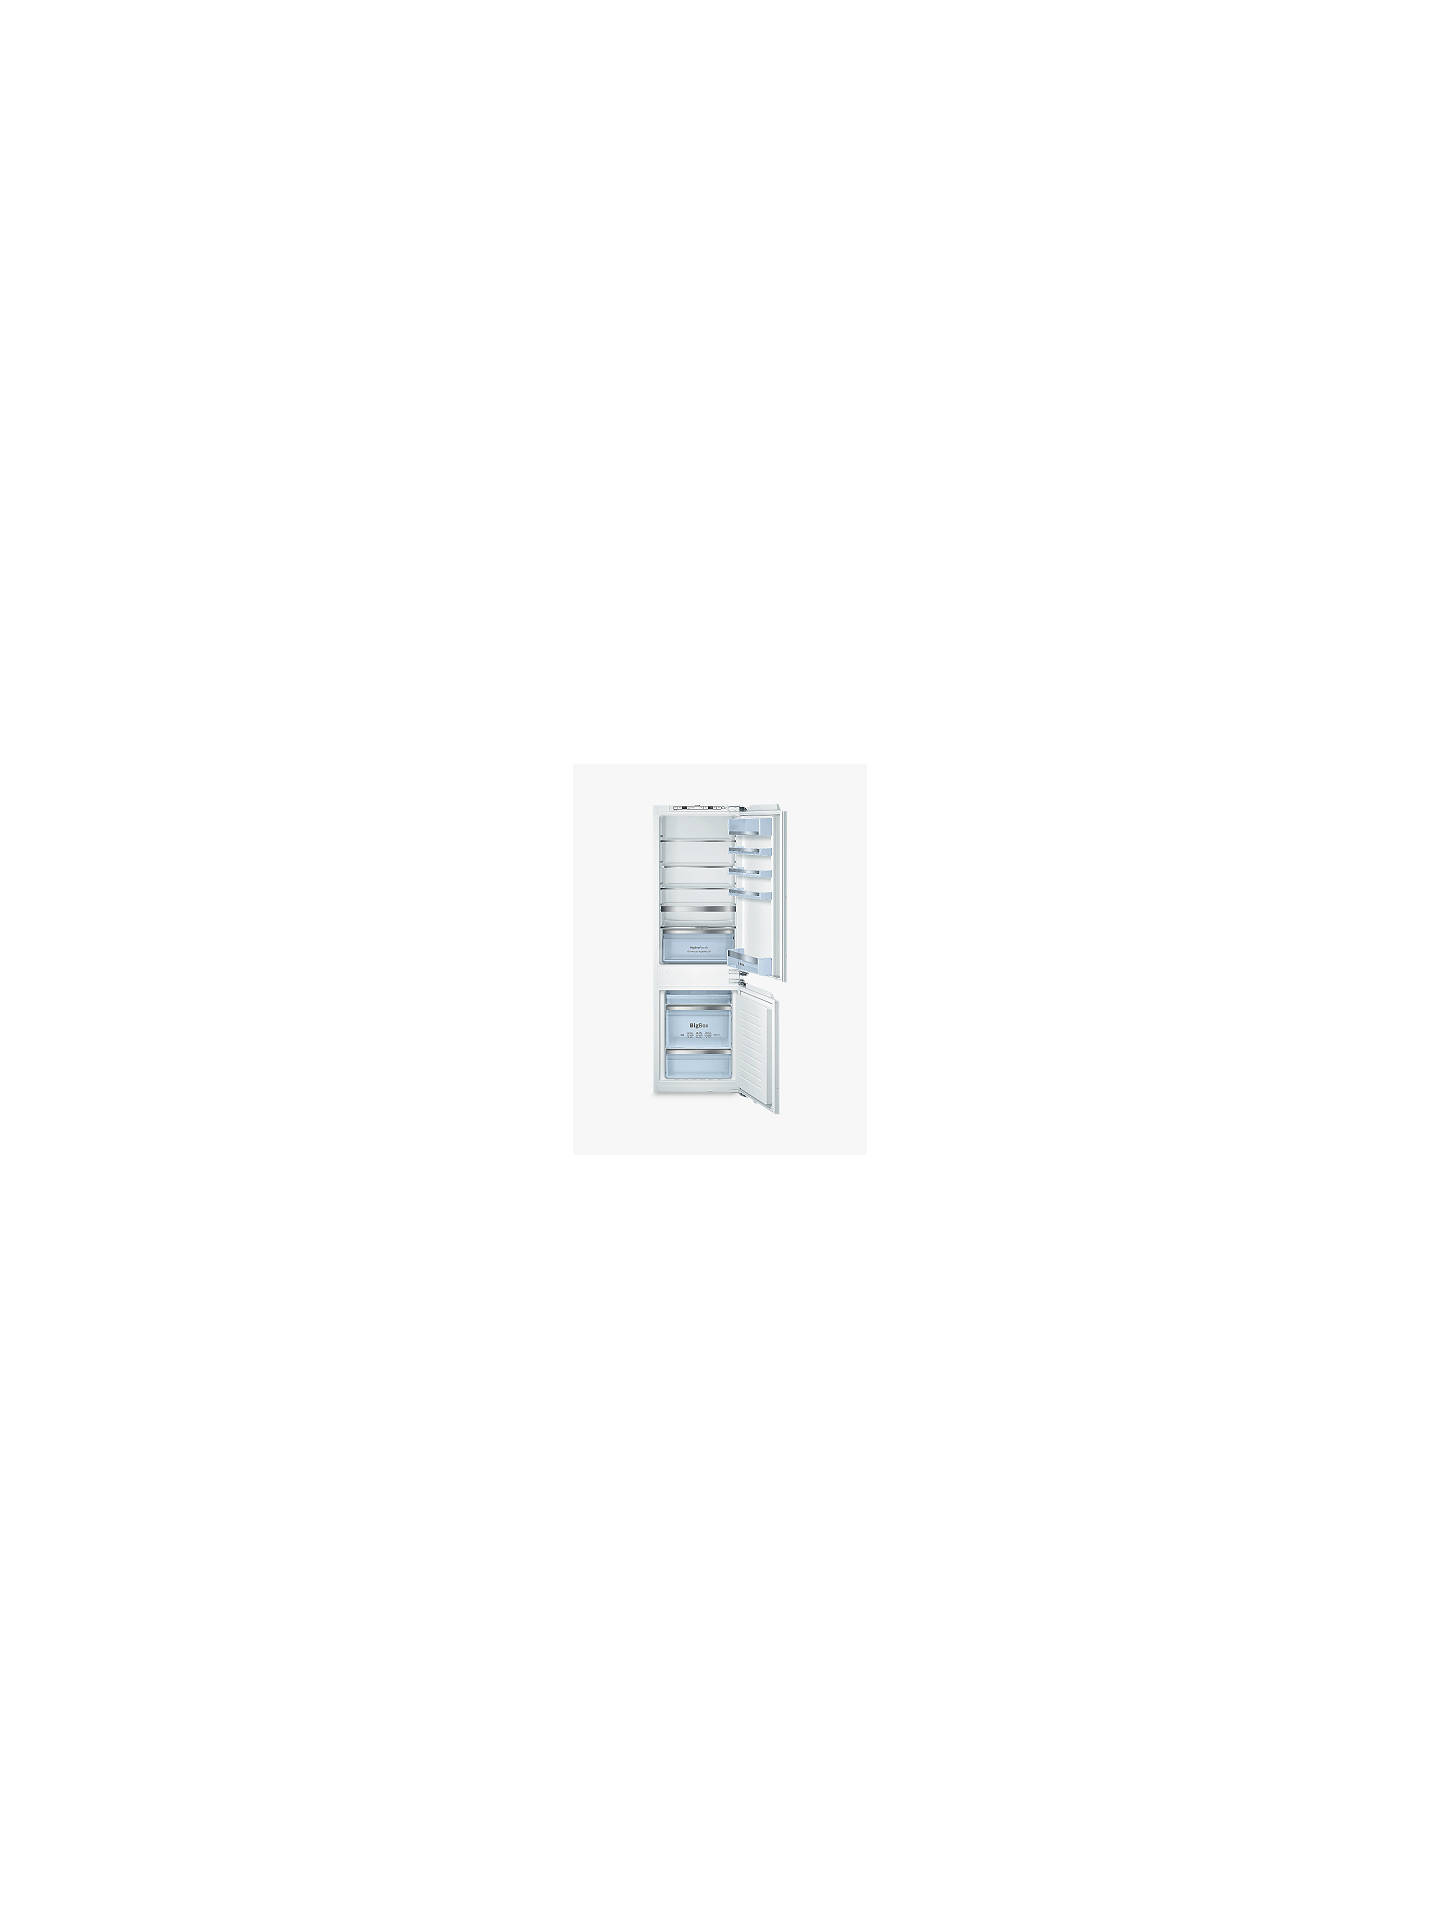 ea66ce27f9b4 Buy Bosch KIN86AD30G Integrated Fridge Freezer, A++ Energy Rating, 56cm  Wide Online at johnlewis ...